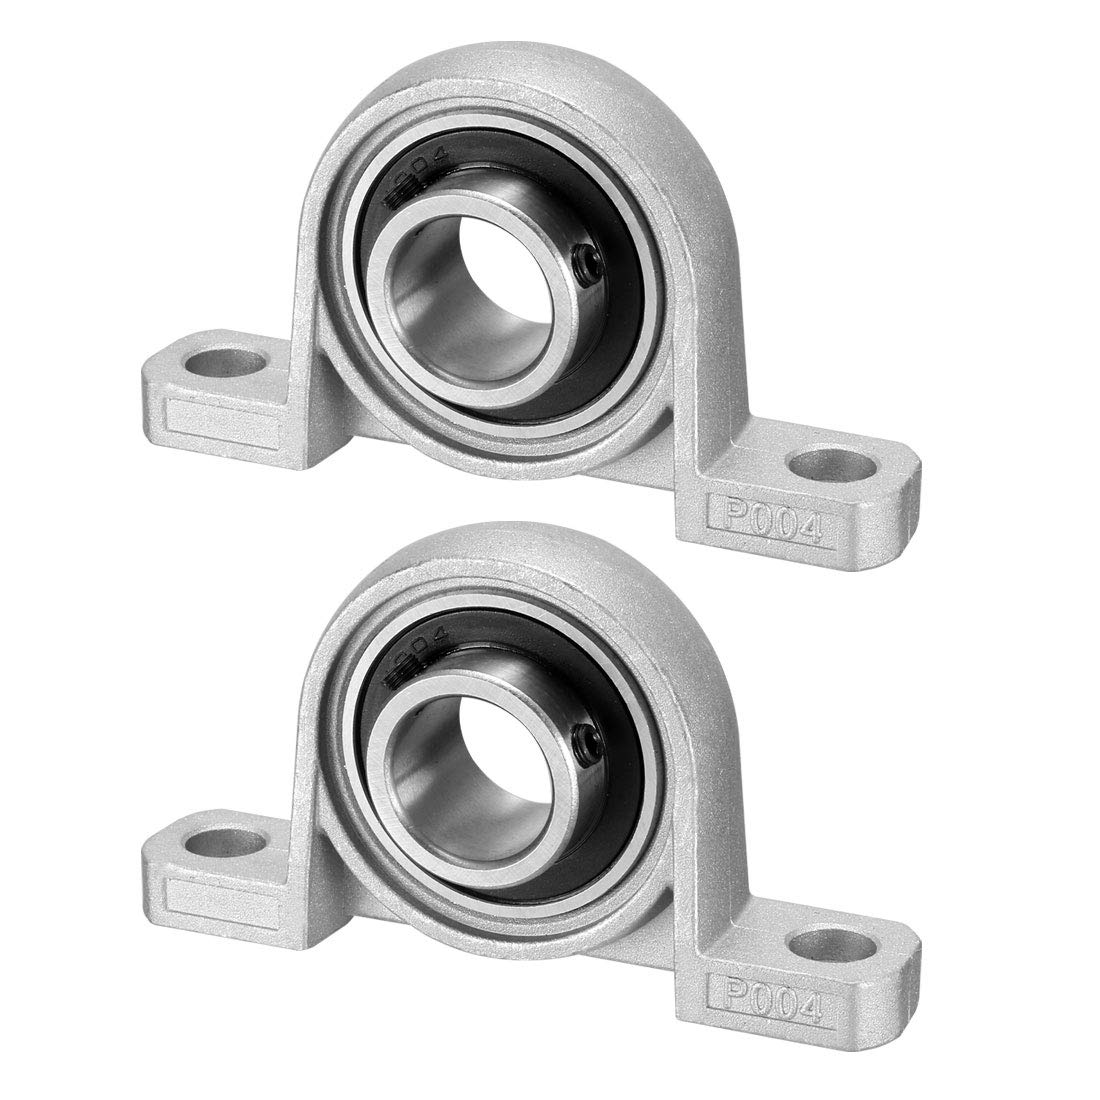 uxcell KP004 Pillow Block Bearing Zinc Alloy//Chrome Steel Set Screw Lock 20mm Bore Diameter Pack of 2